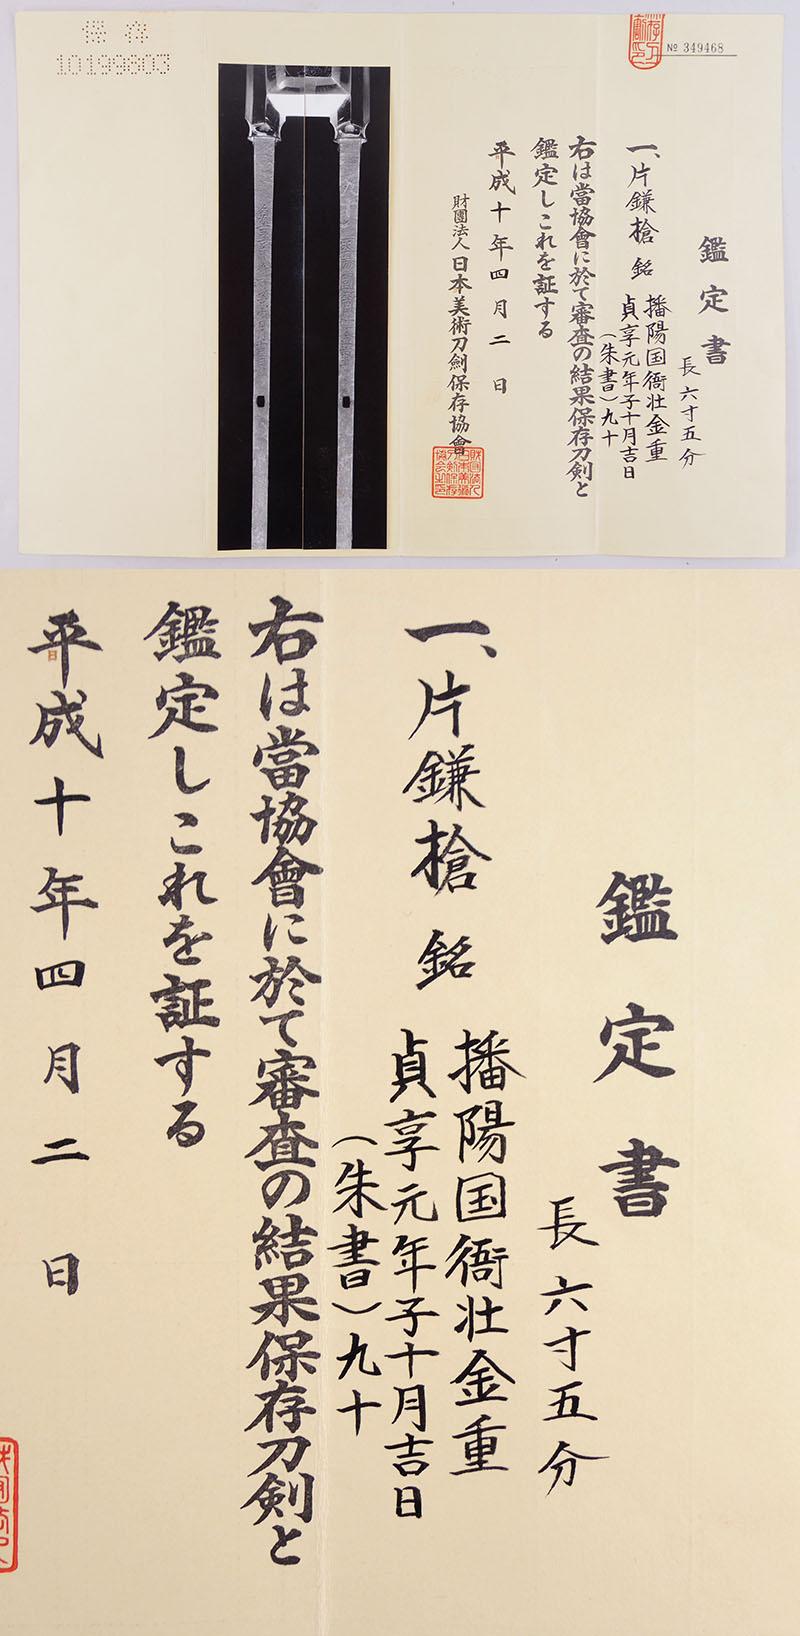 播陽国衙壮金重 Picture of Certificate